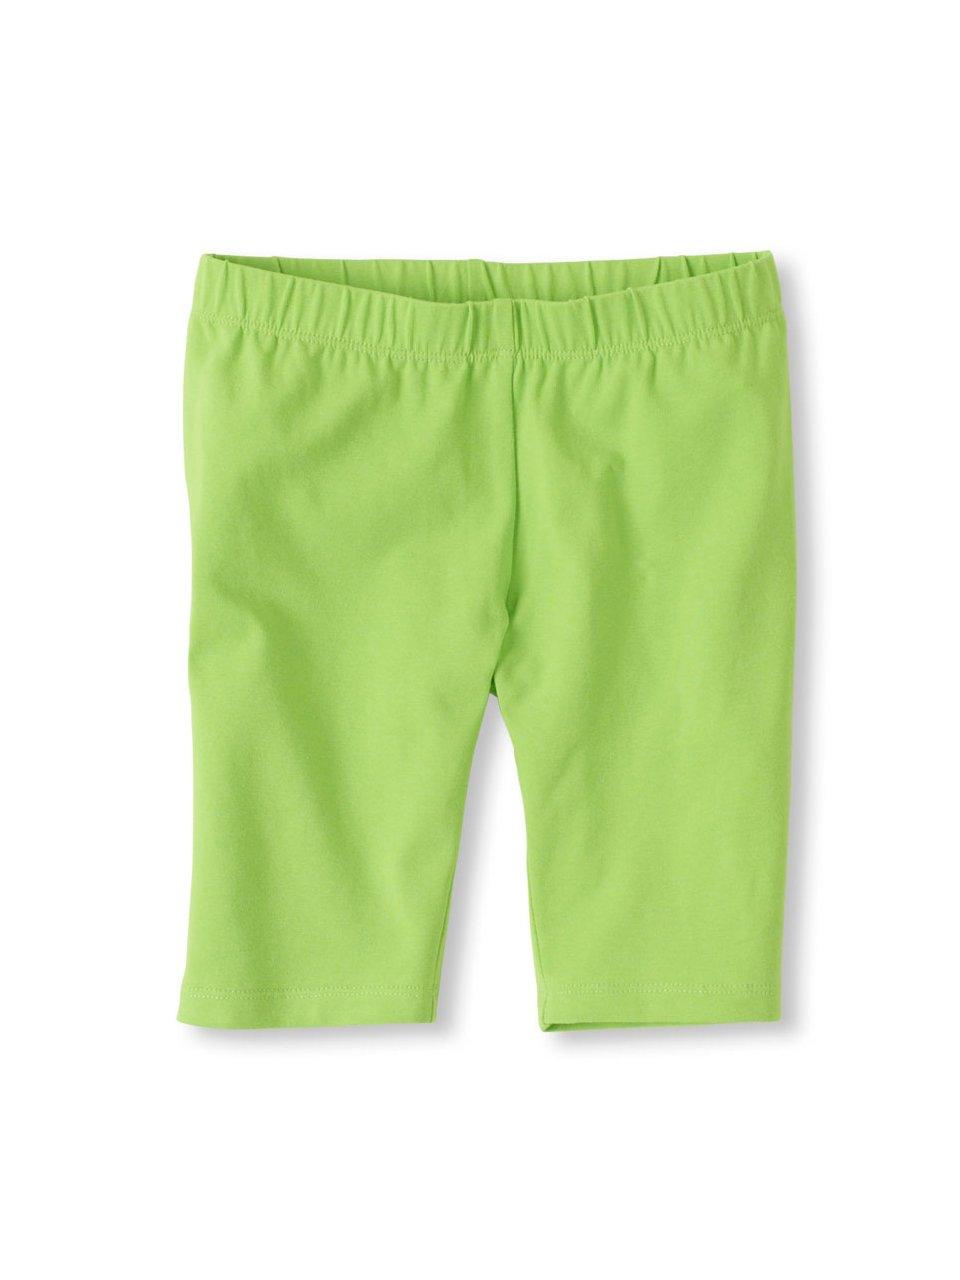 Vivian's Fashions Legging Shorts - Girls, Biker Length, Cotton (Lime, Medium)